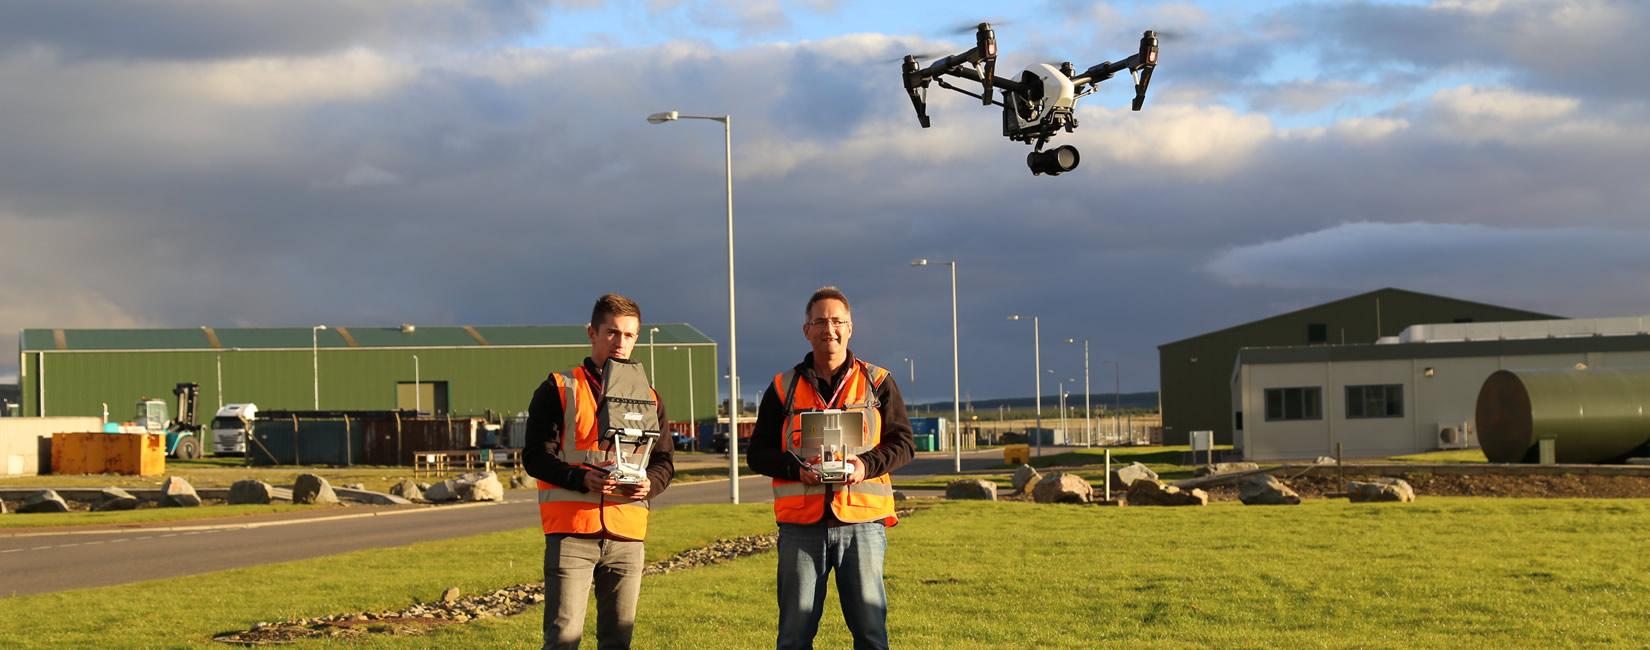 aerialfilming3